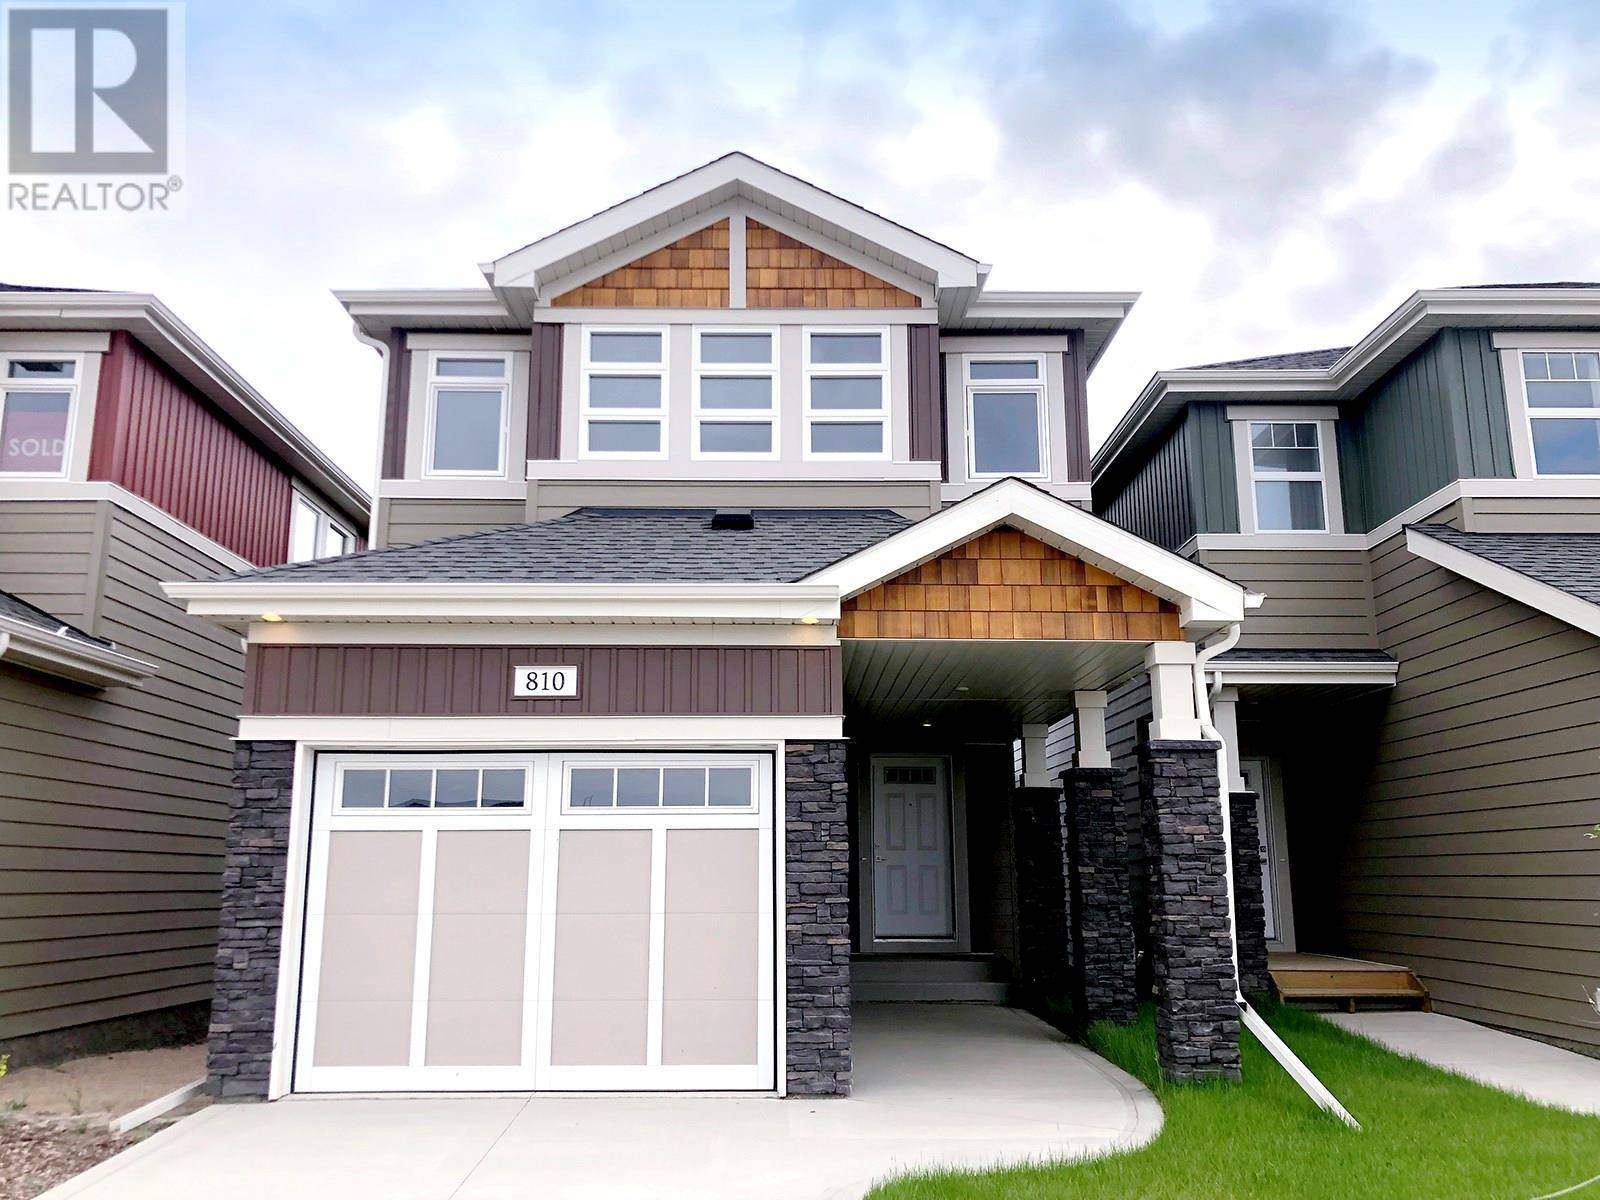 House for sale at 810 Kensington Blvd Saskatoon Saskatchewan - MLS: SK782997